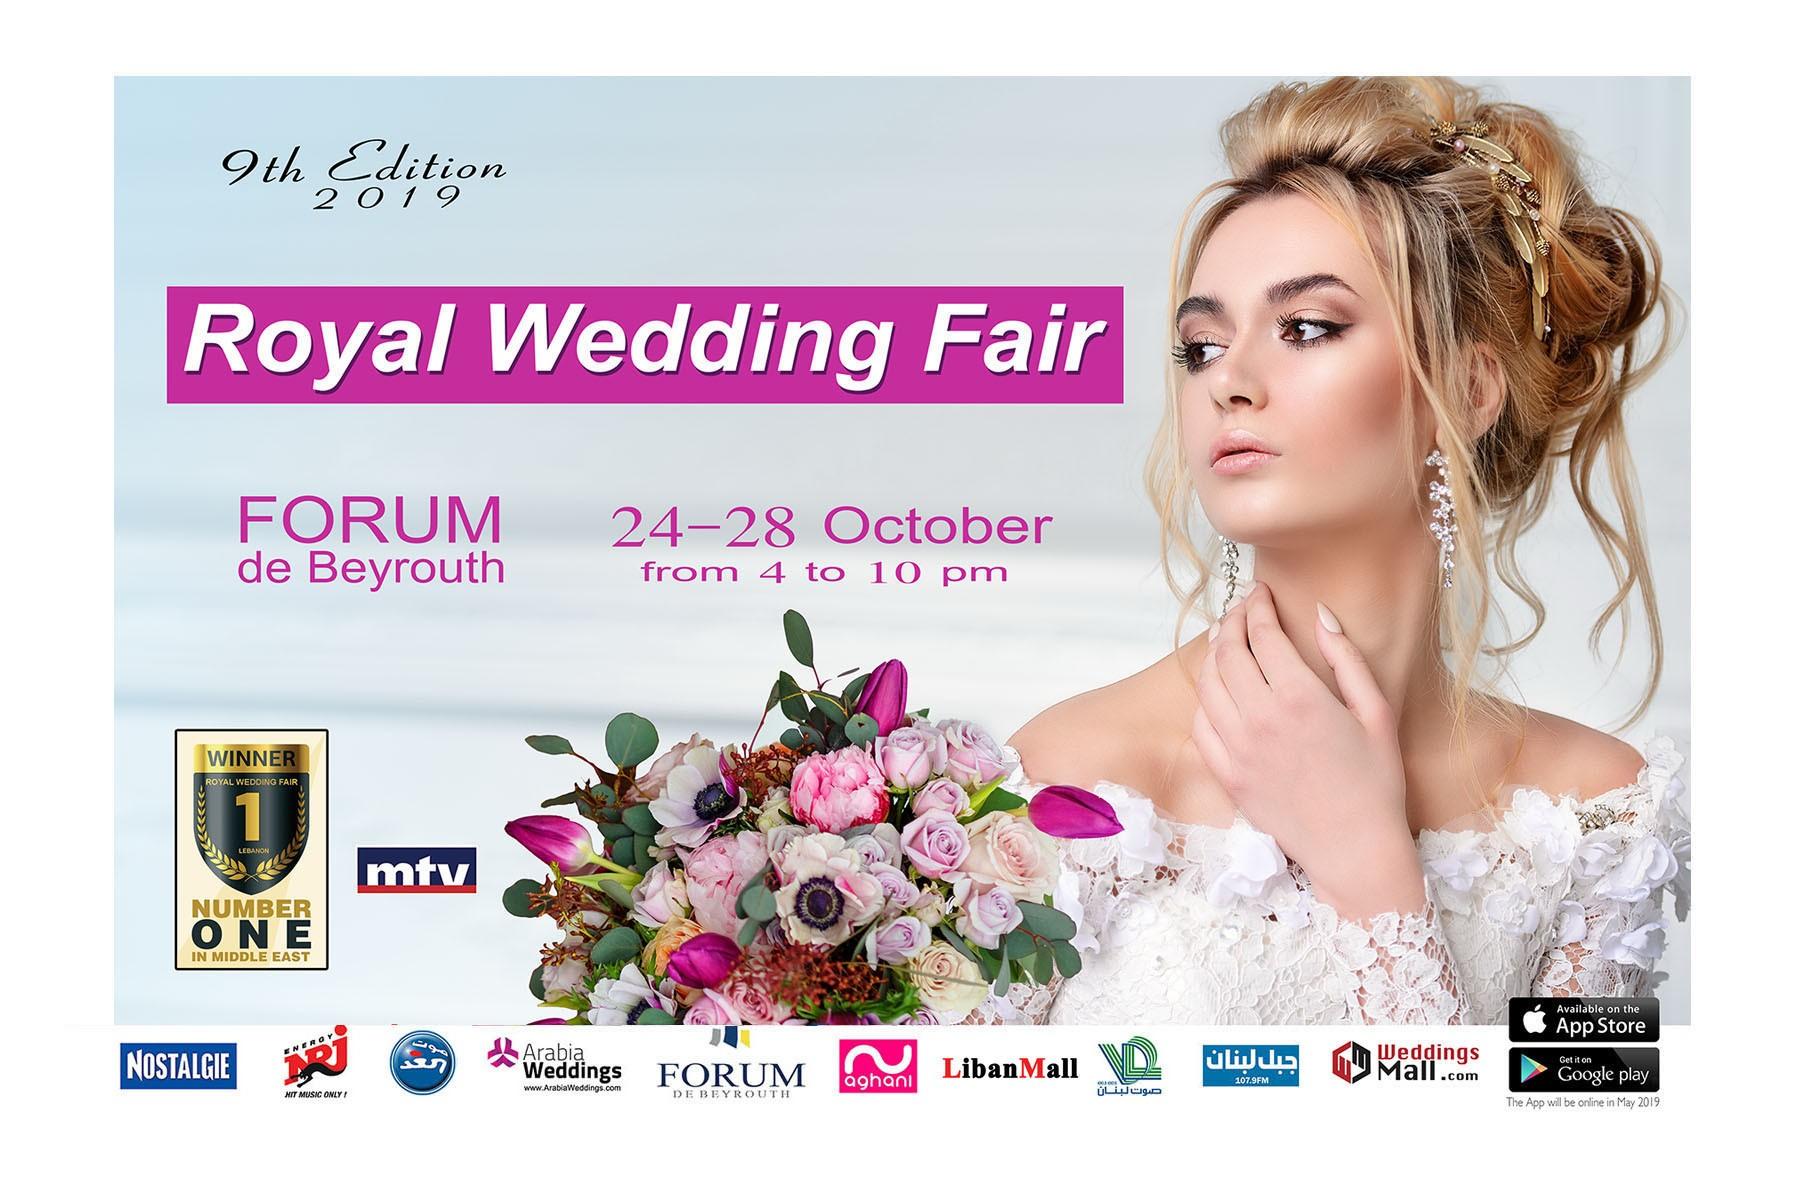 Royal Wedding Fair 2019